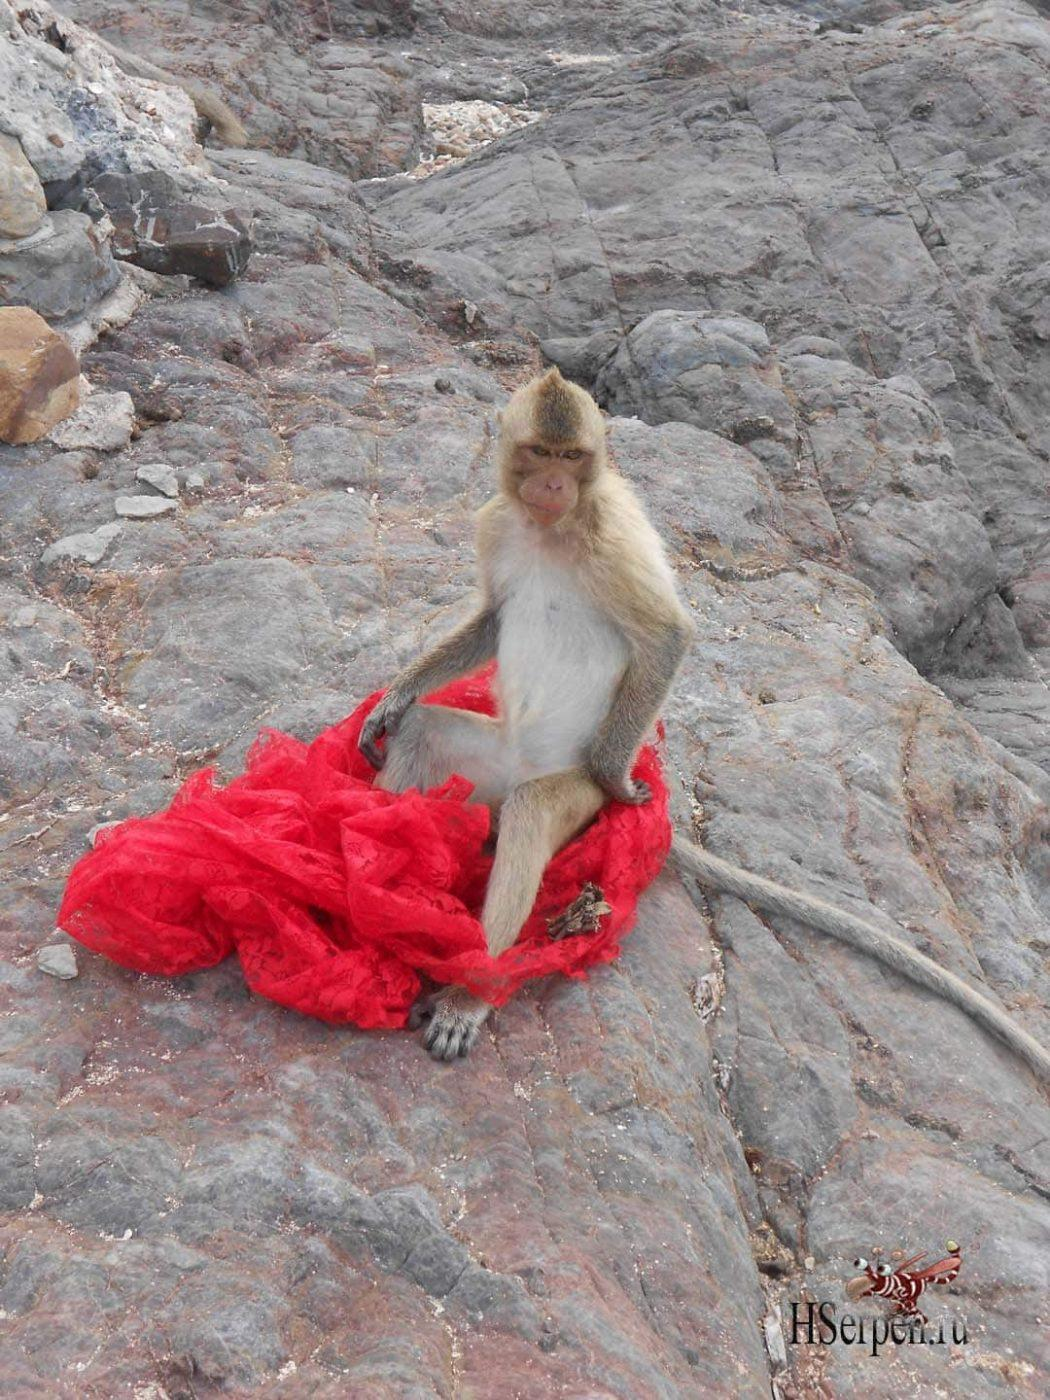 Истории острова обезьян, часть 2